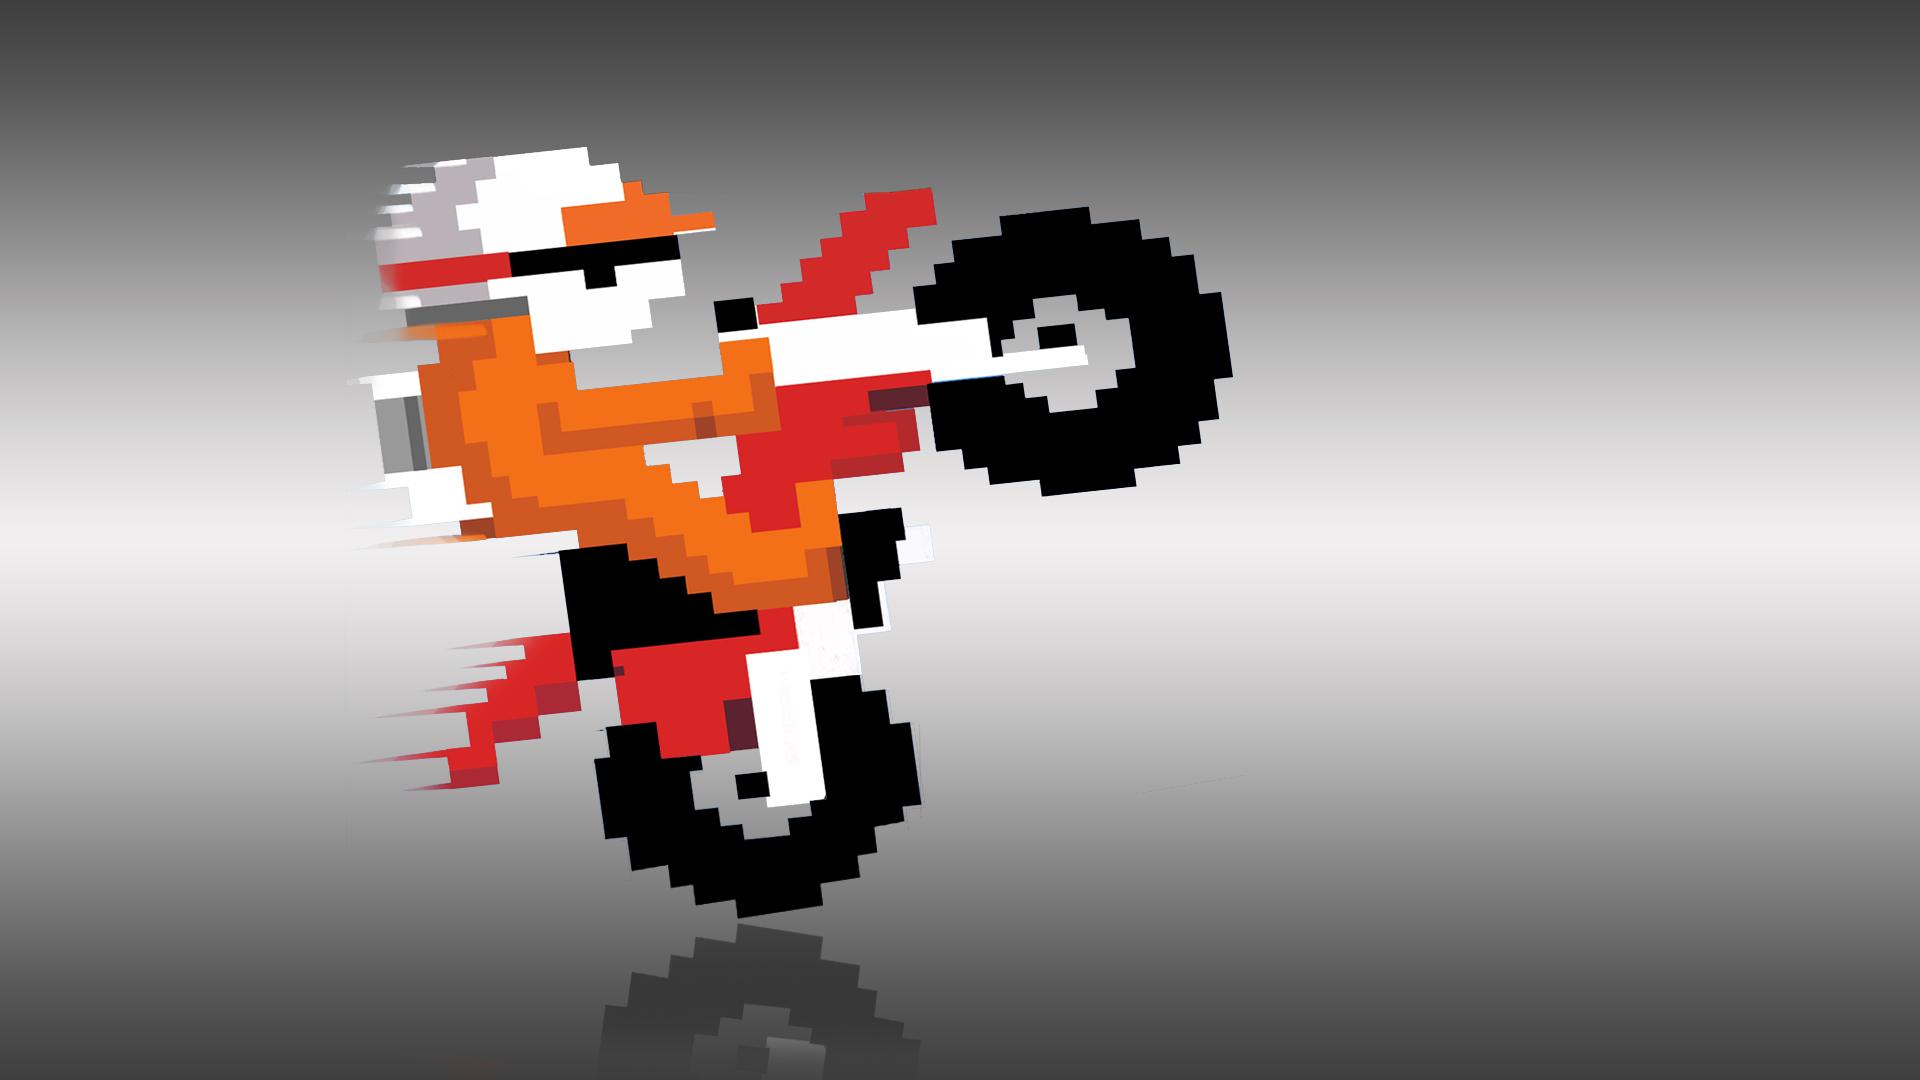 3d Bike Wallpaper Image Download Excitebike Details Launchbox Games Database